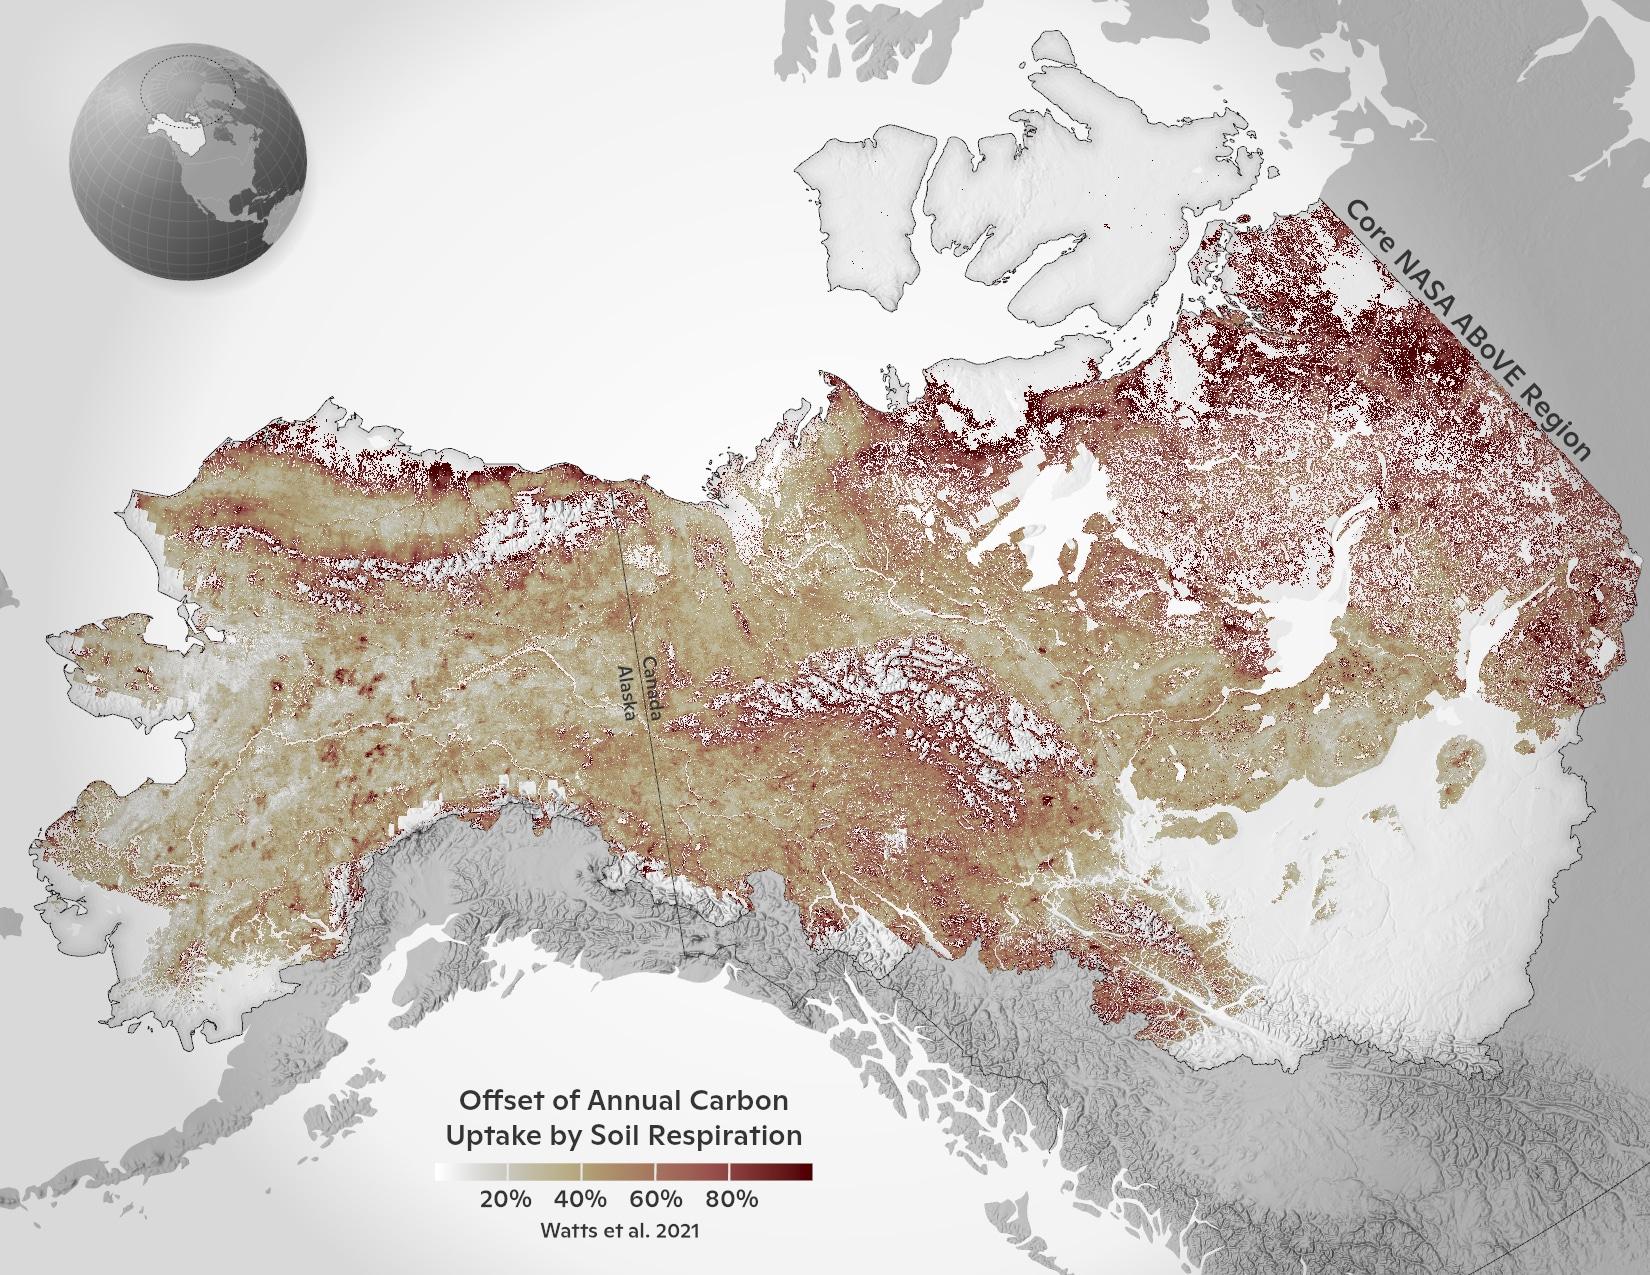 map of soil respiration offsetting carbon uptake